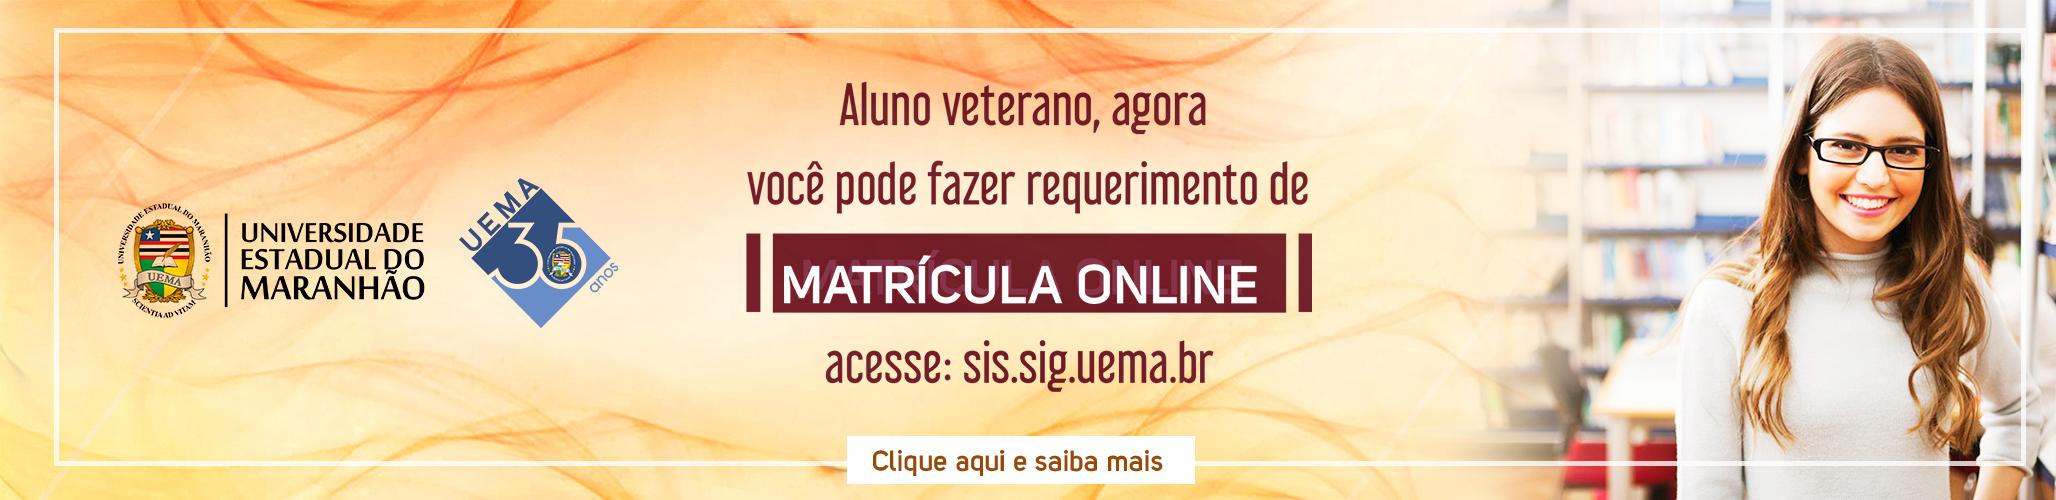 banner-Matricula-veterano2